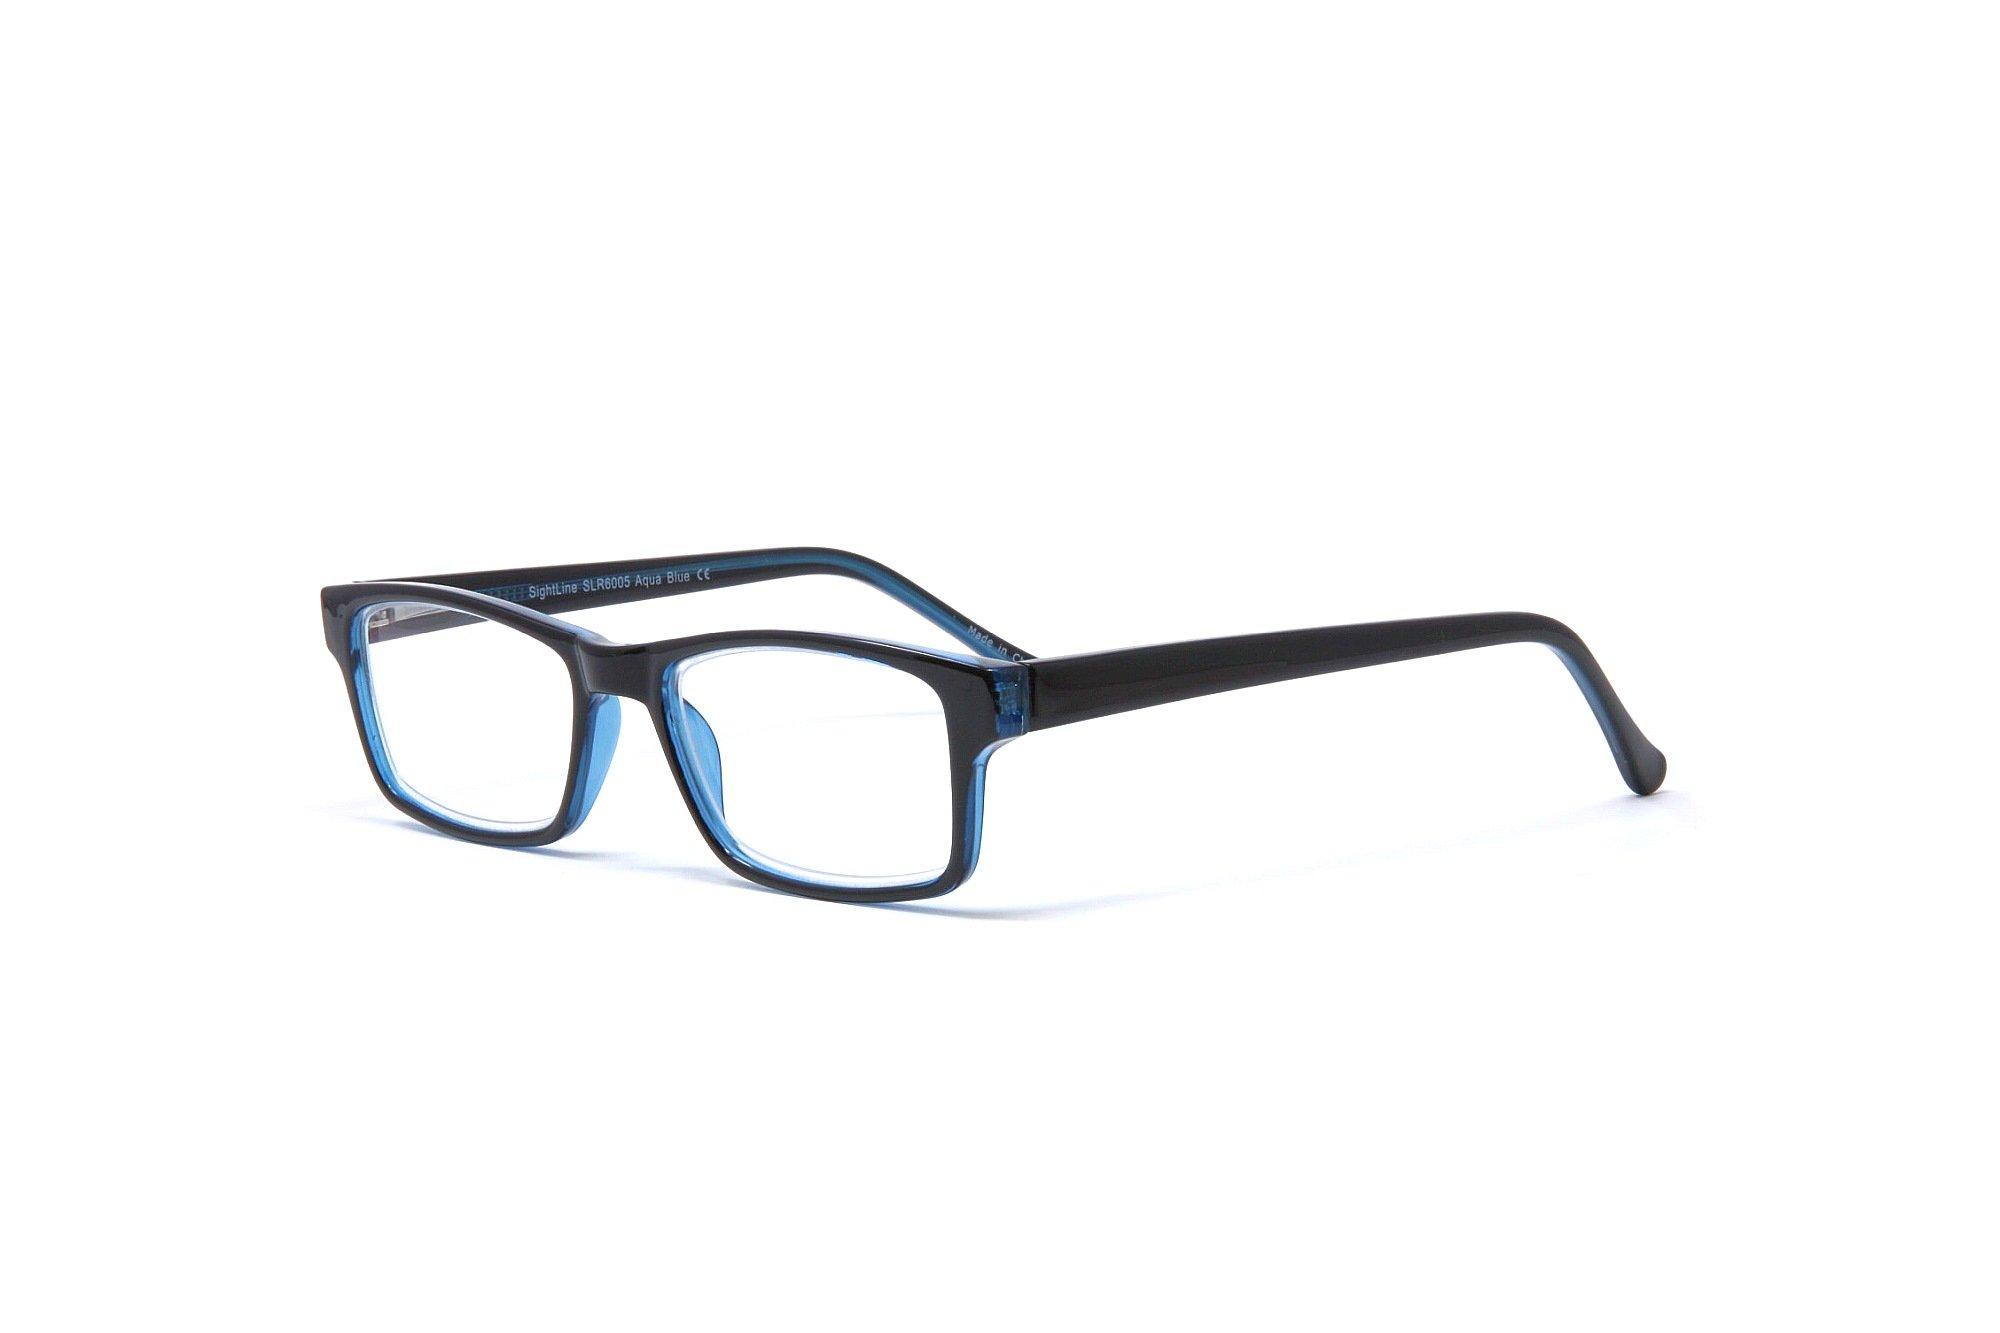 Sightline 6005 Multifocal Reading Glasses Progressive Magnification Lenses with Anti-Glare Coating; Frame Size: 54-15/148